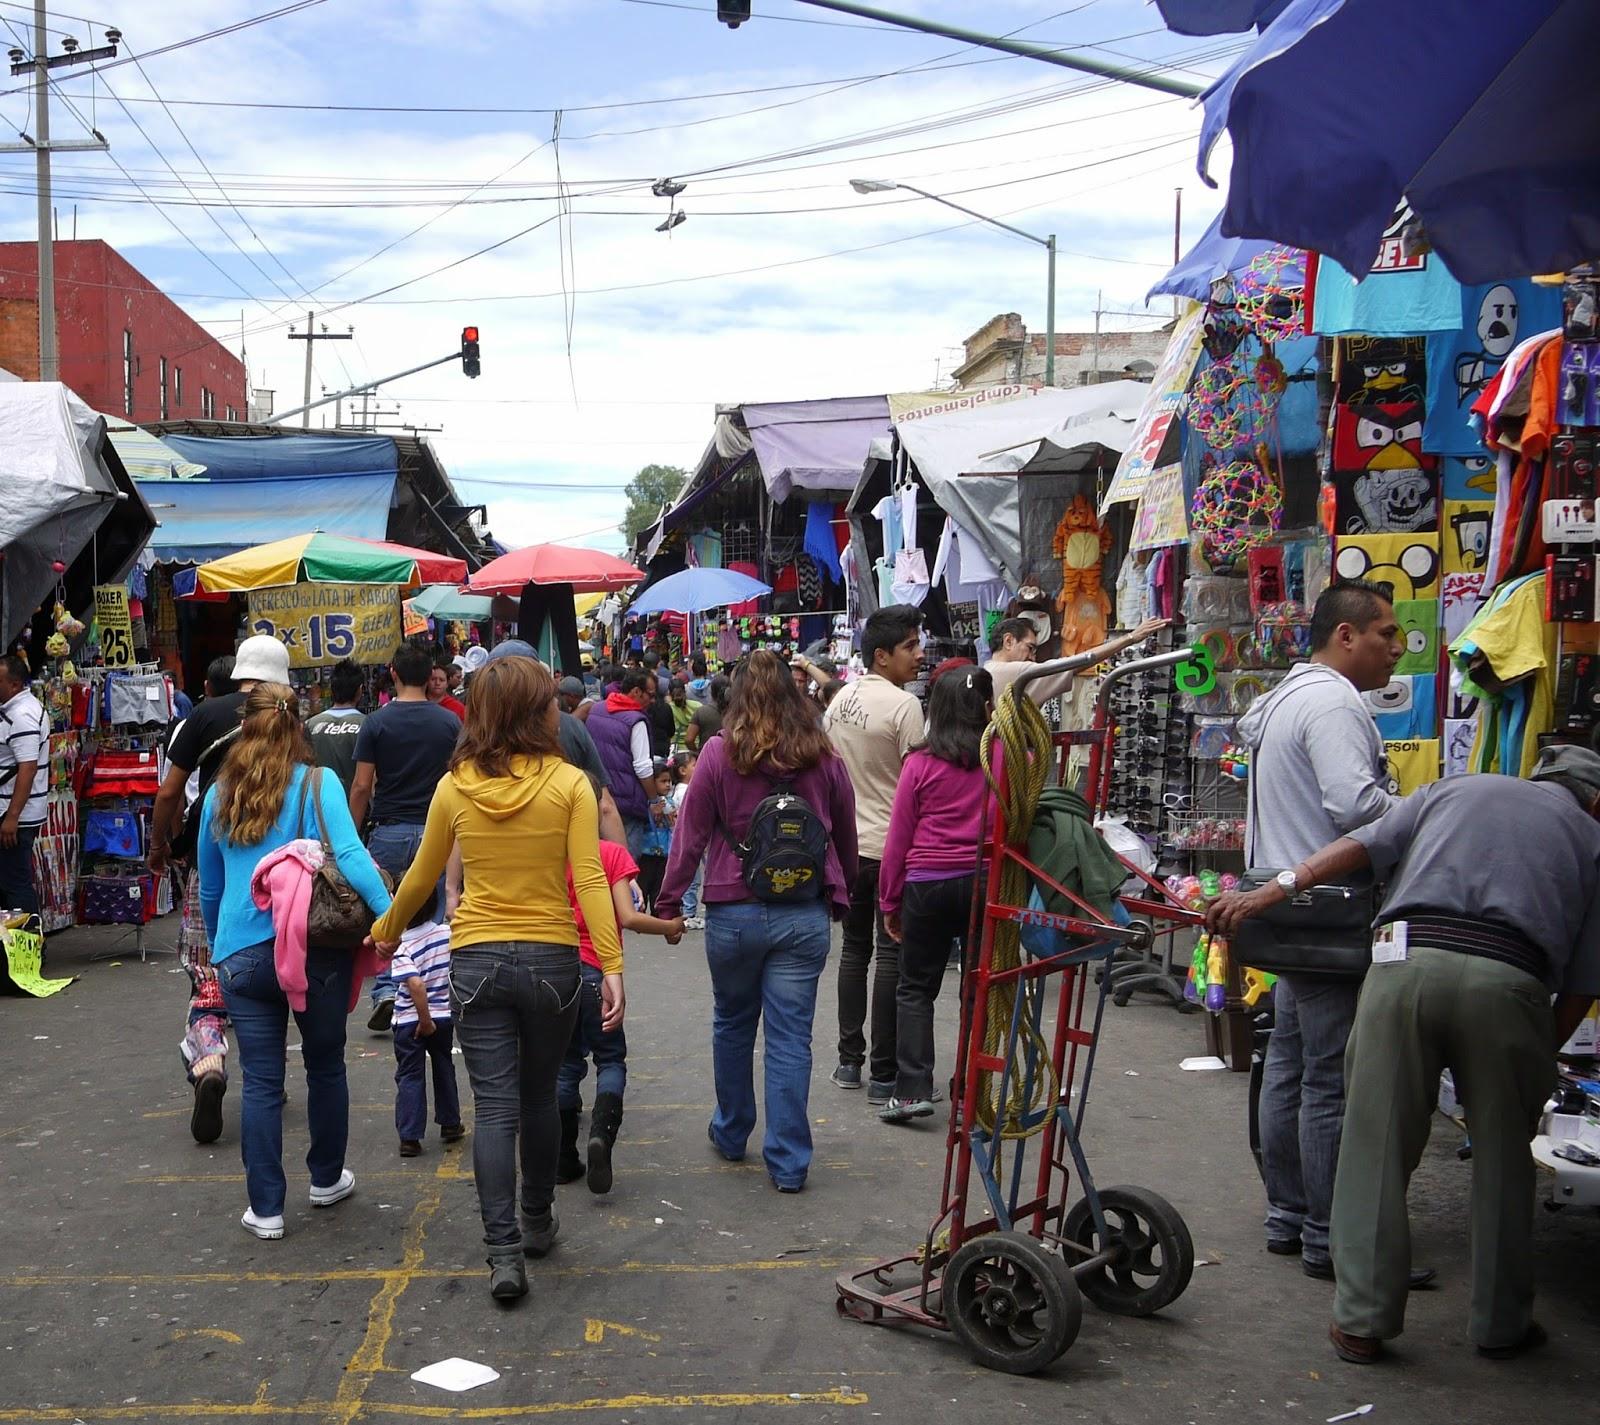 Street Gourmet LA  Tepito  El Barrio de La Comida Brava a6b7c87dc7b